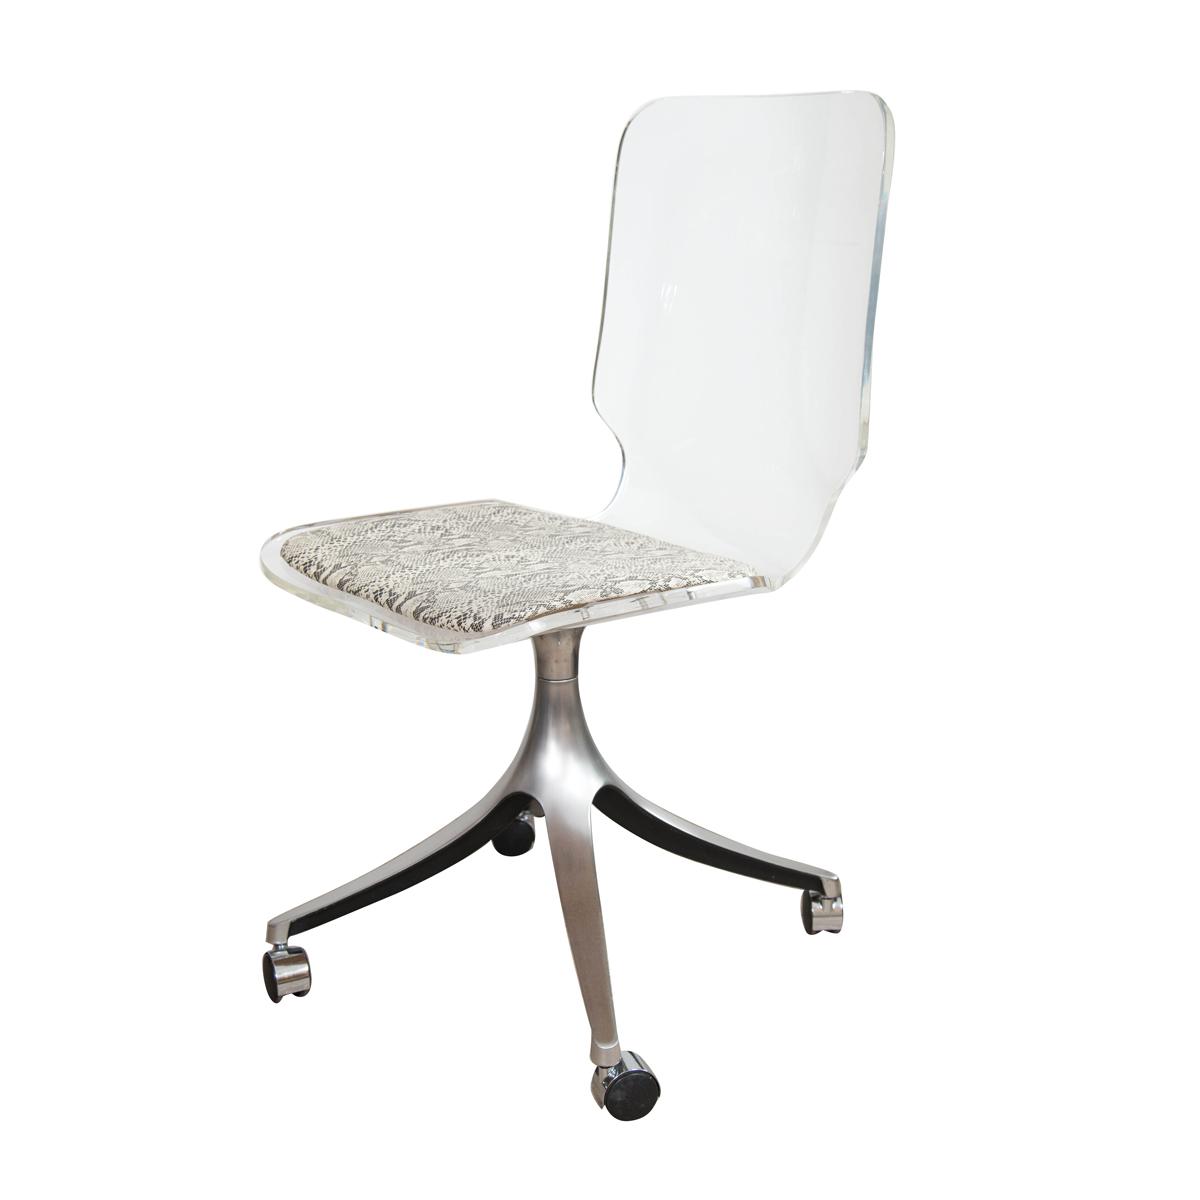 Image of: Lucite Desk Chair Chairs John Salibello